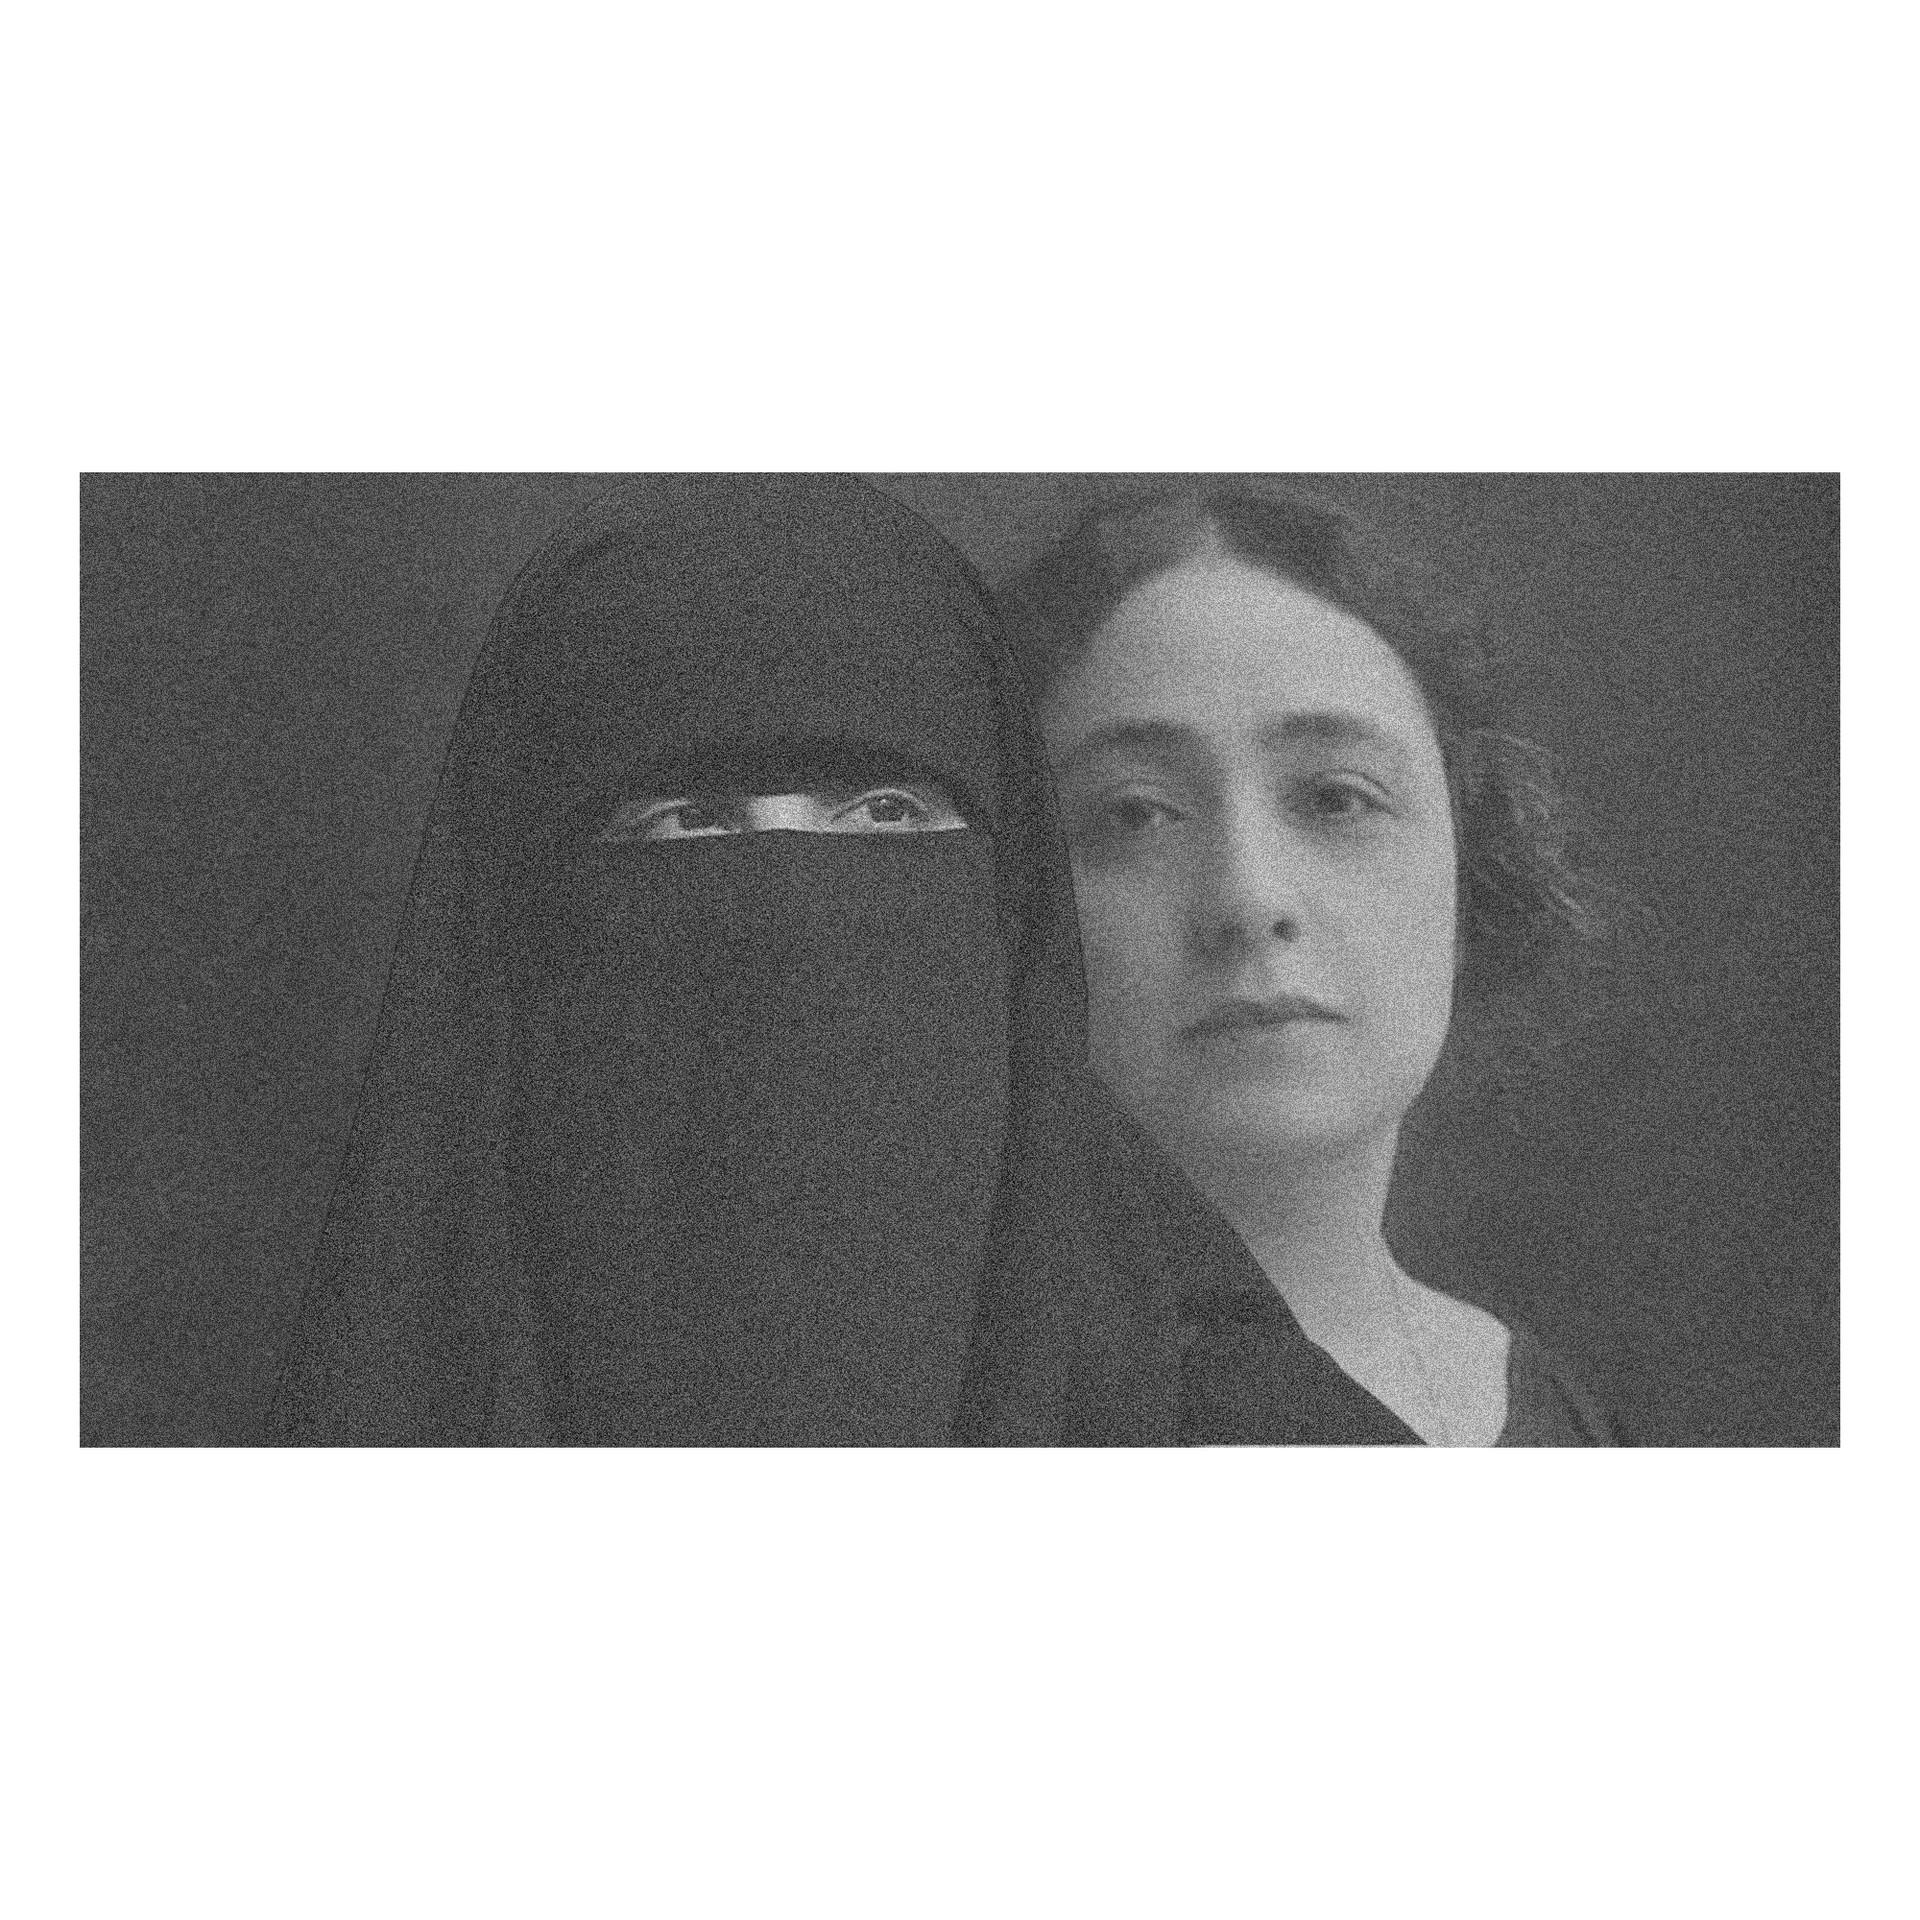 Amina and Huda